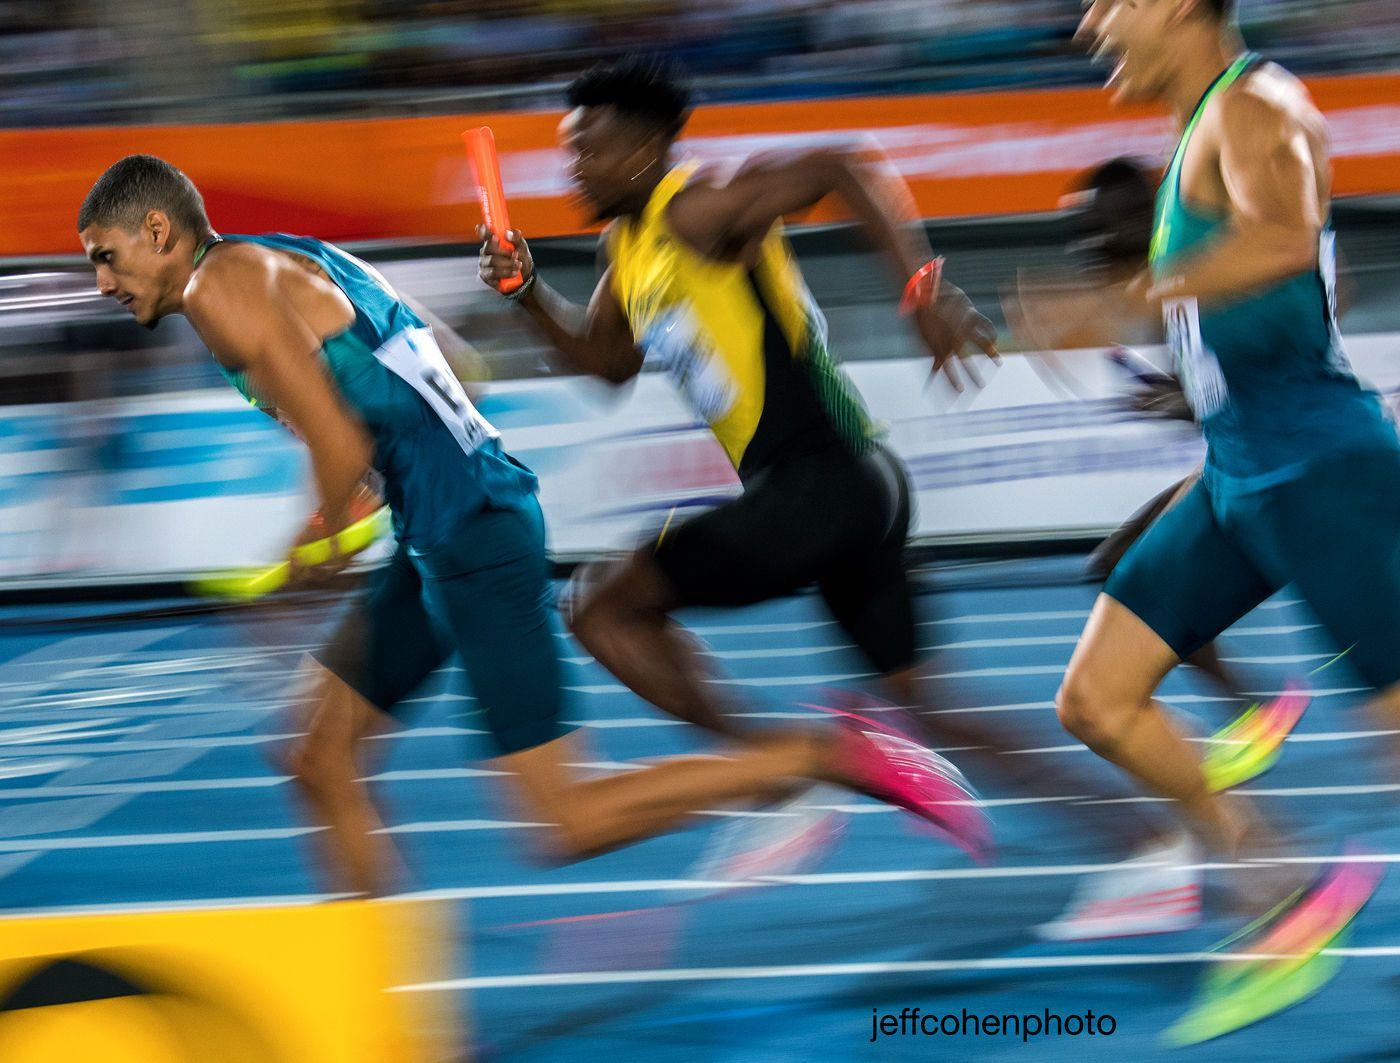 1r2017_bahamas_relays_day_1_4x400m_blur____jeff_cohen_photo__1722_web.jpg